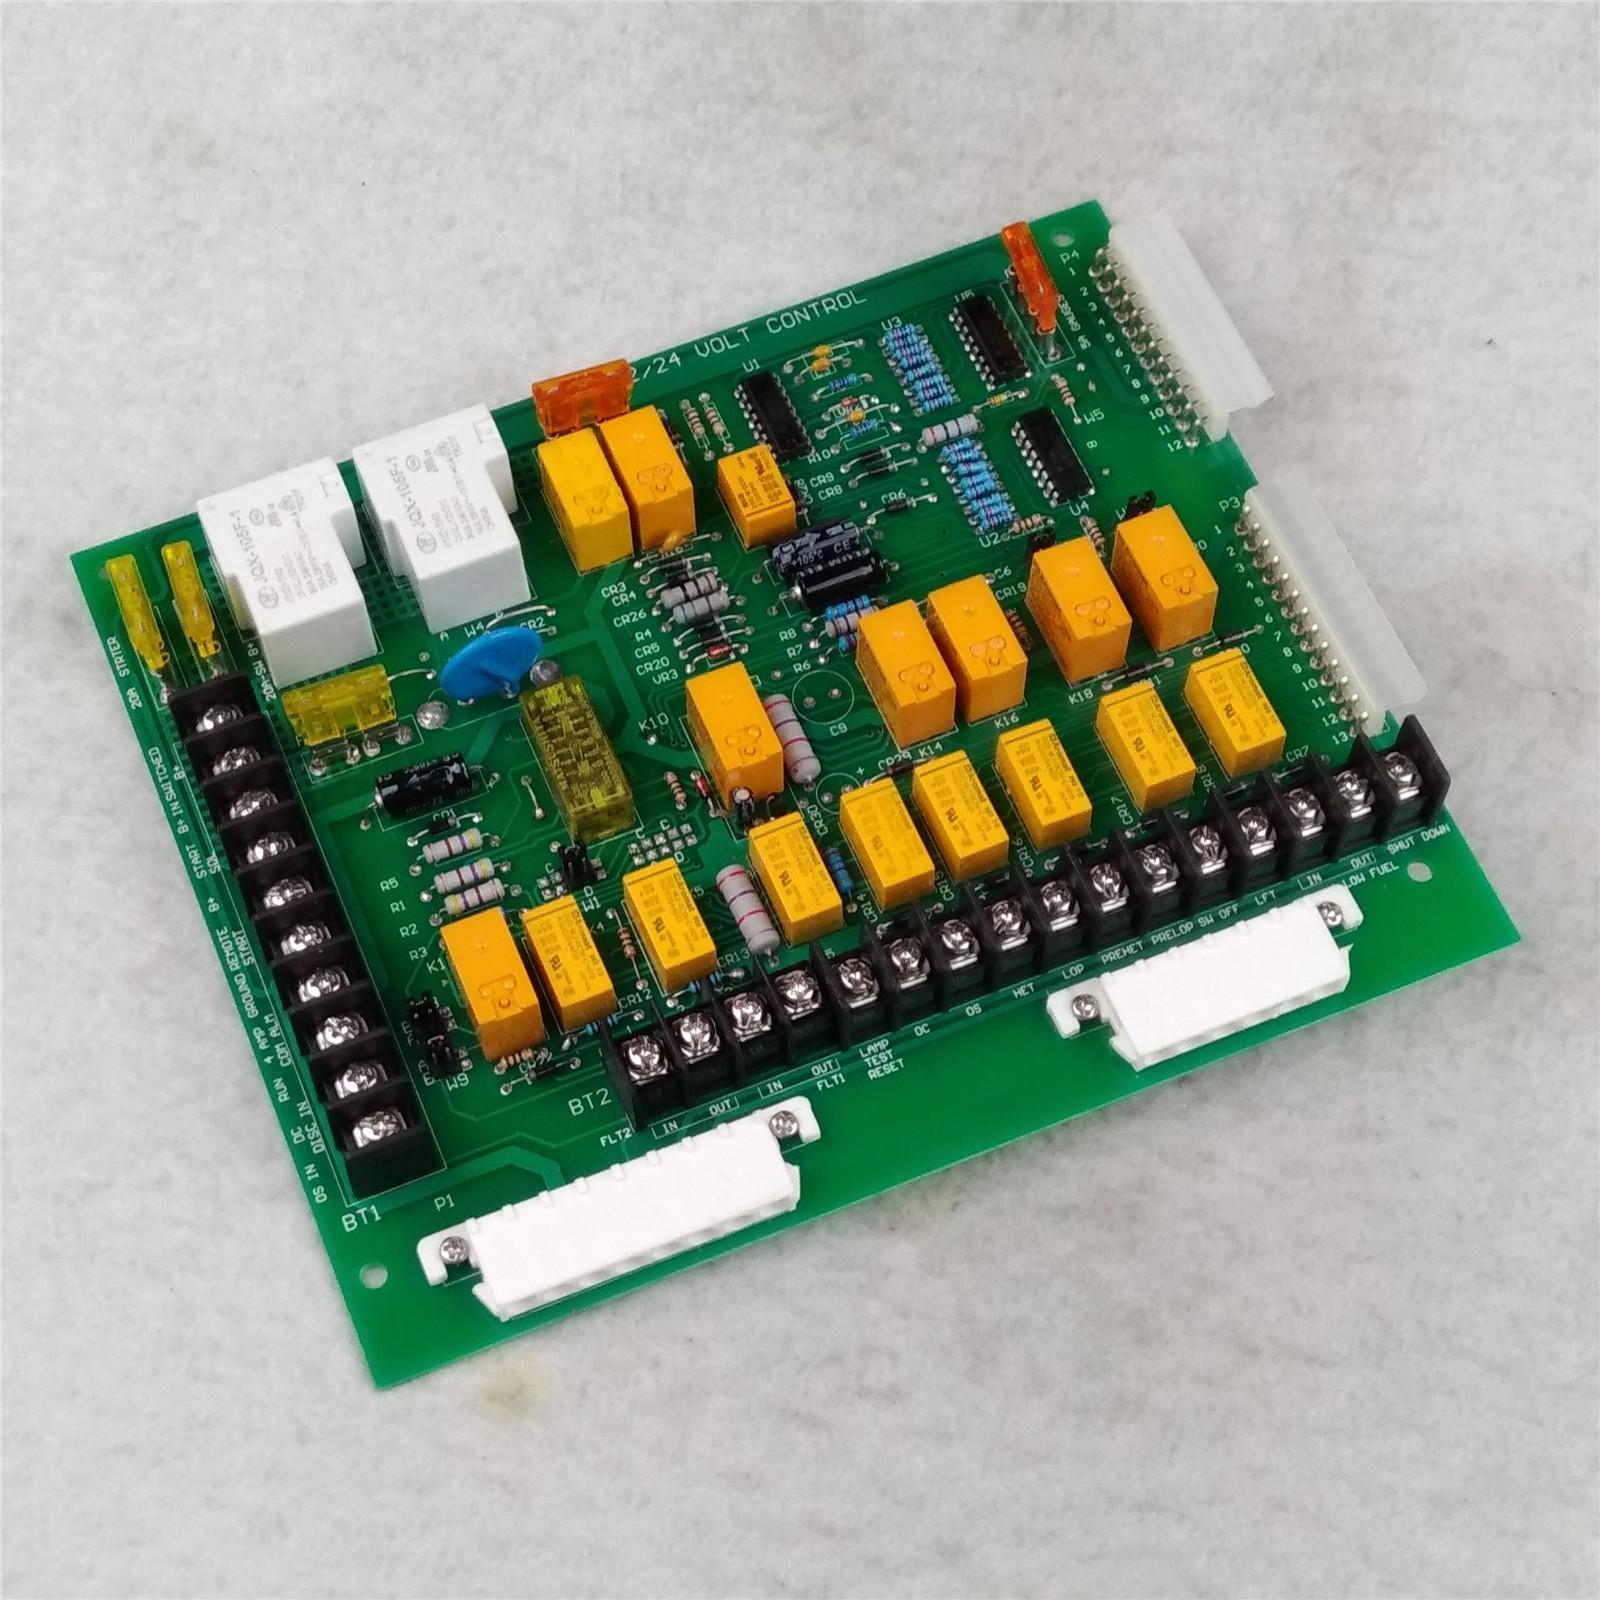 Friday Part Generator Detector Control Board 24V 12 Lights for Onan Control Board 300-2812